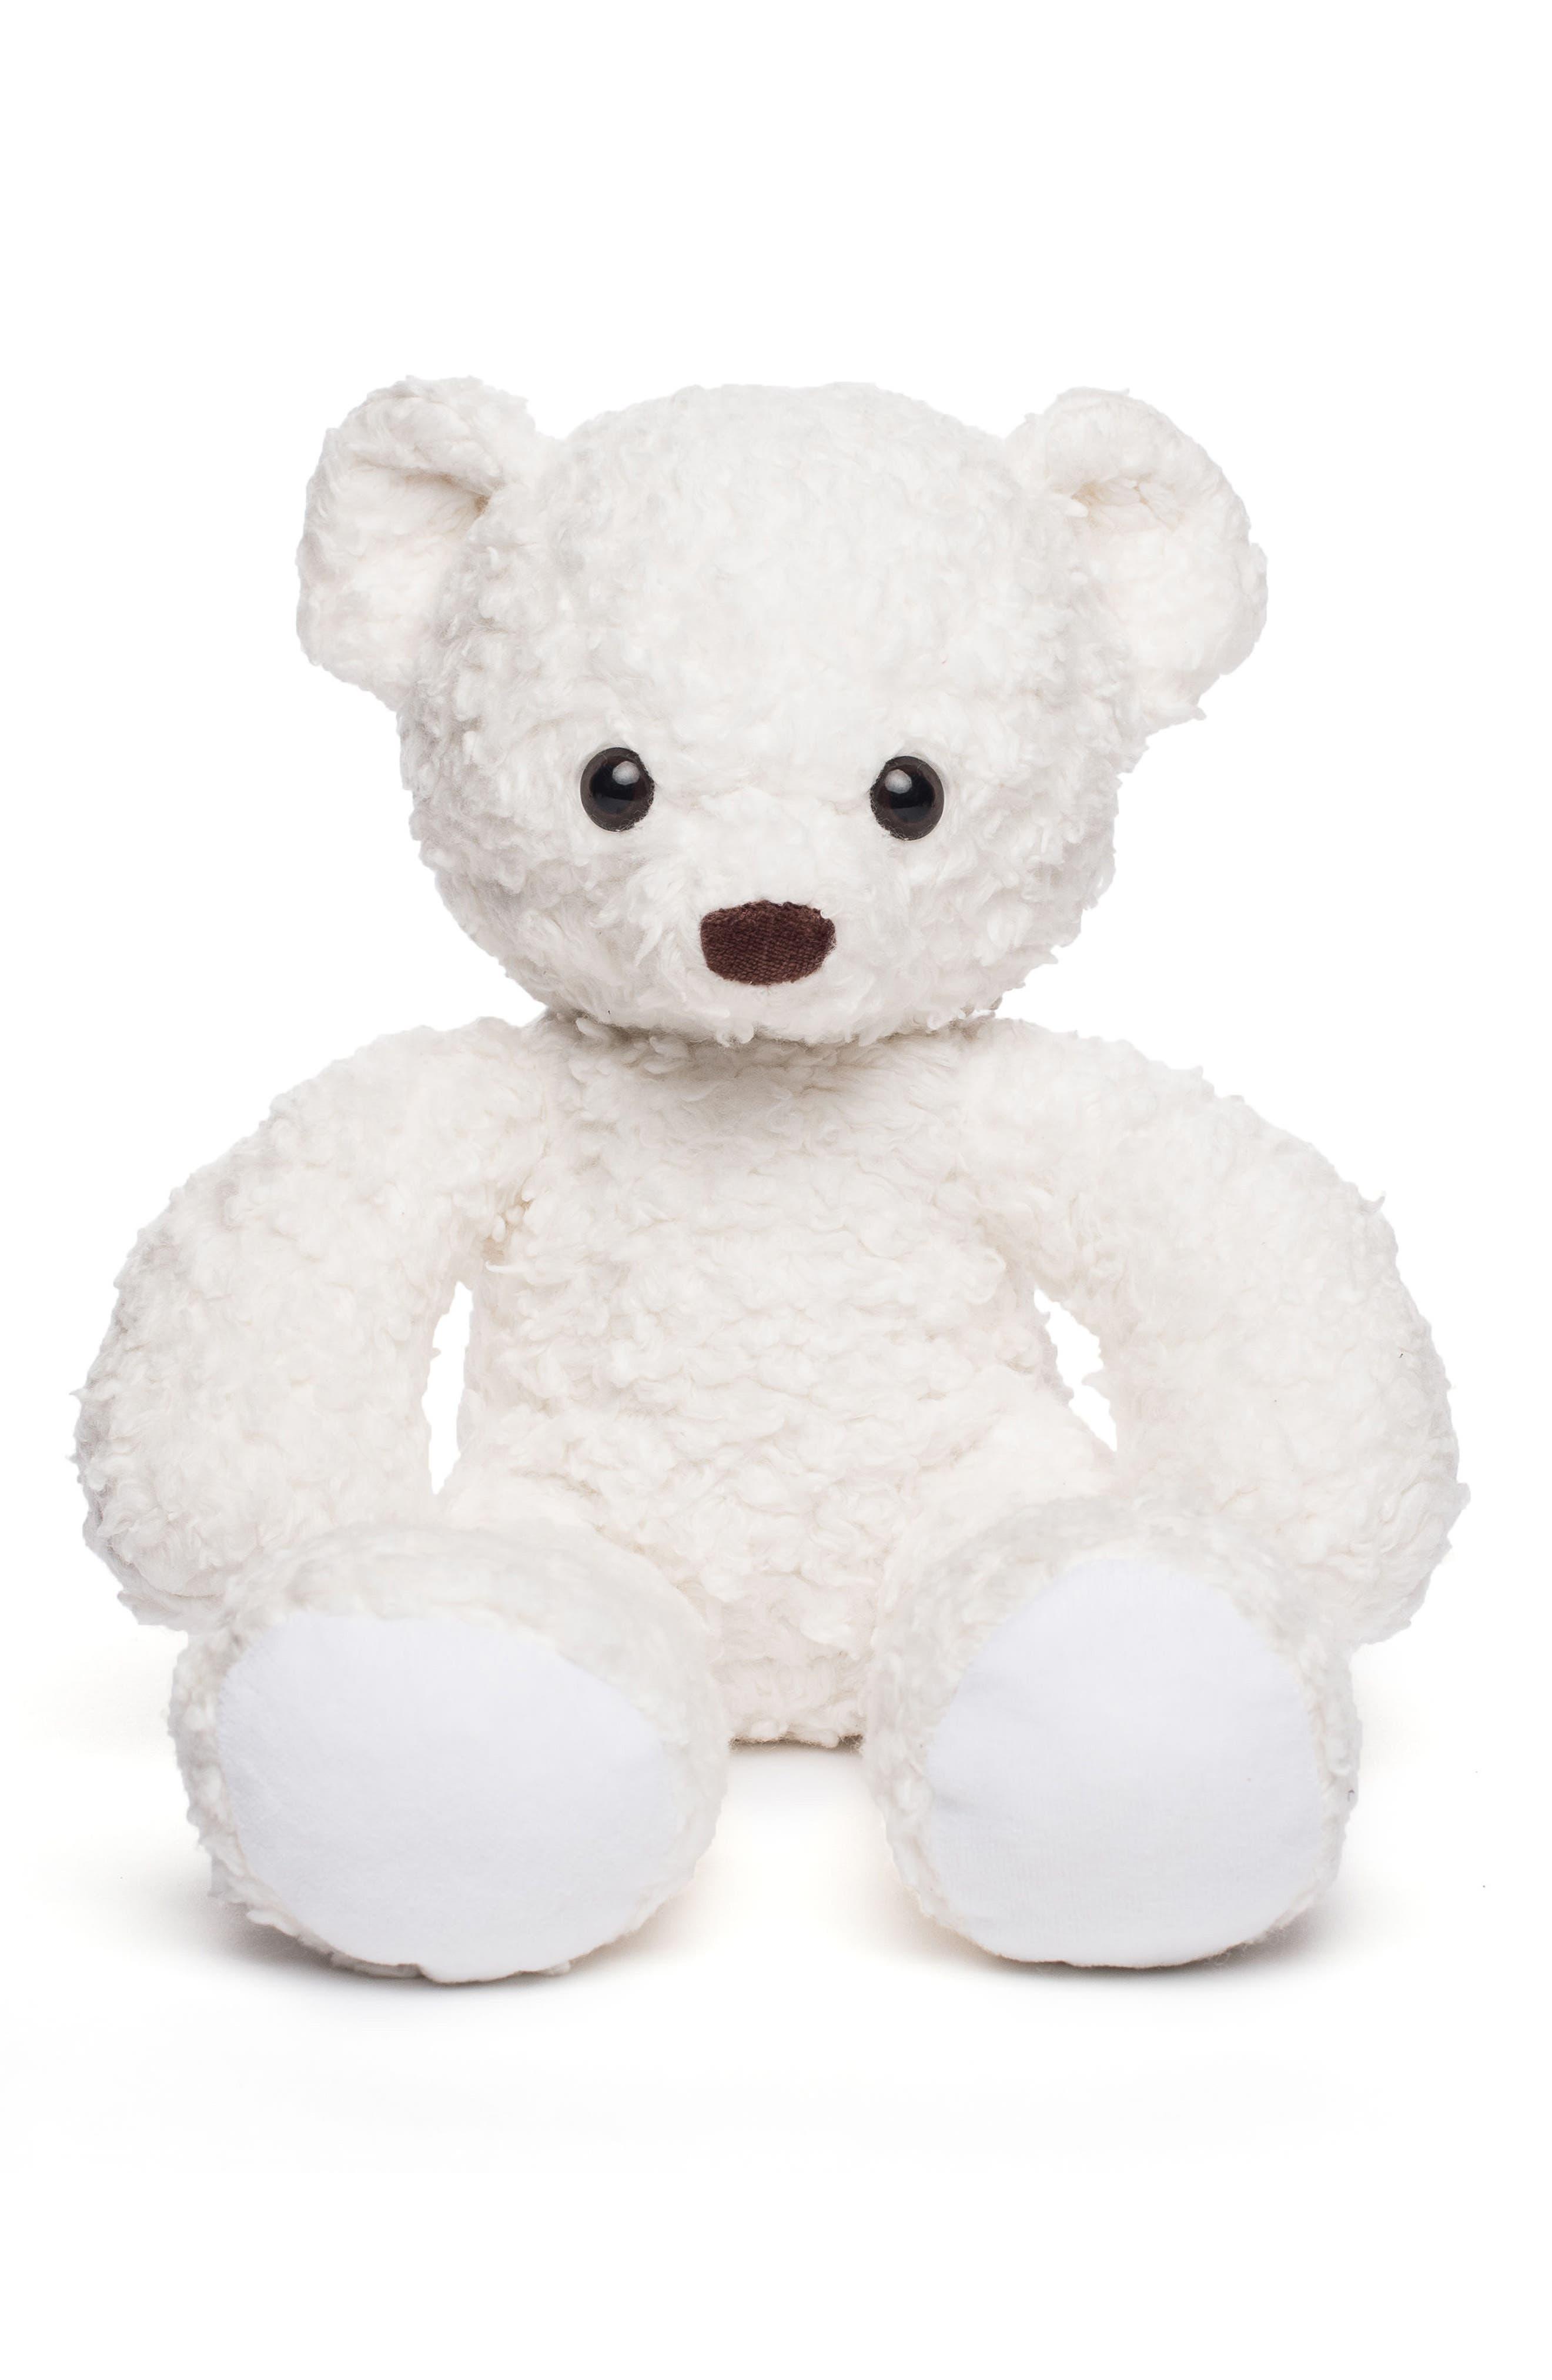 Medium Stuffed Bear,                         Main,                         color, White